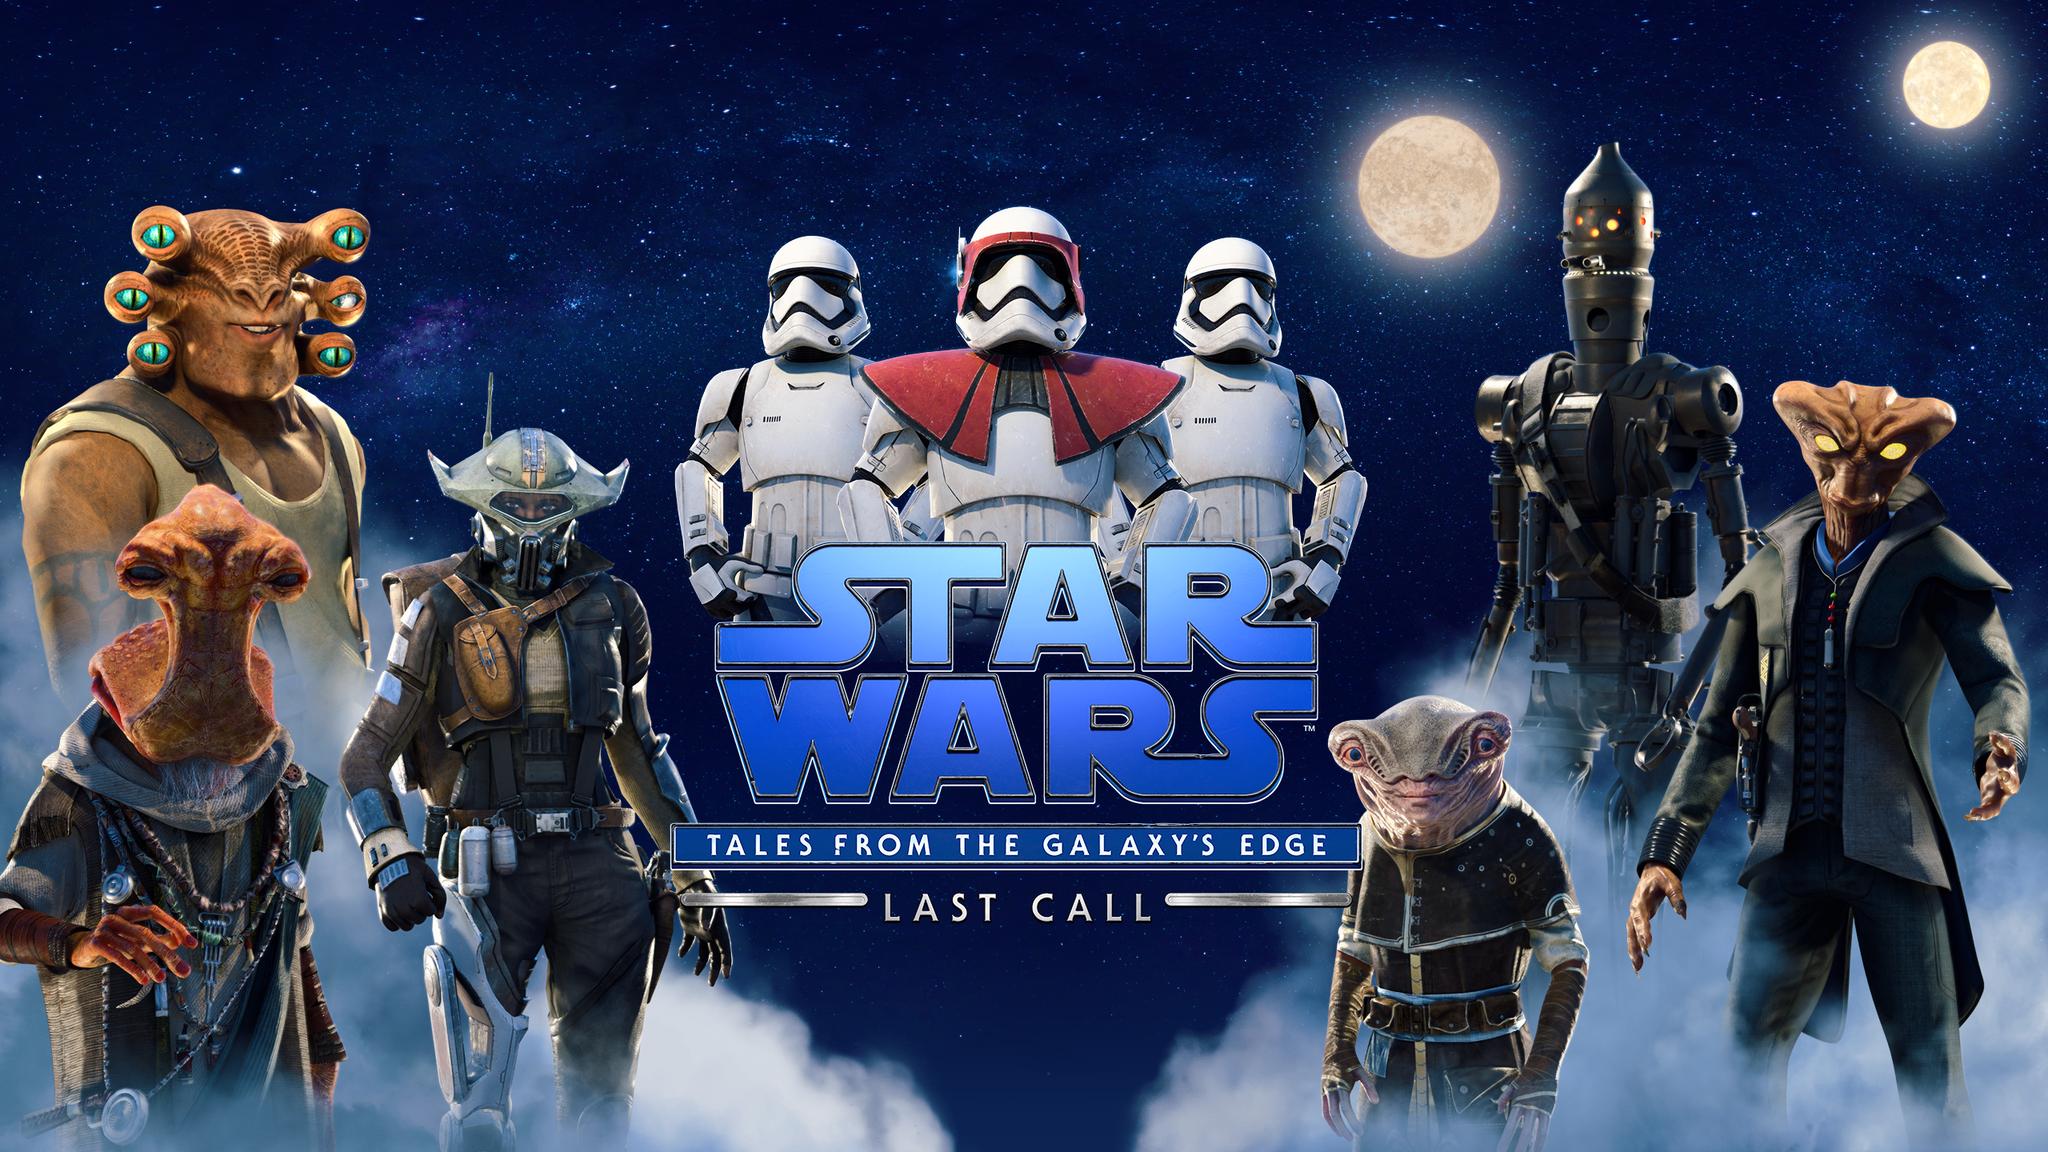 Star Wars: Tales from The Galaxy's Edge - Last Call store art